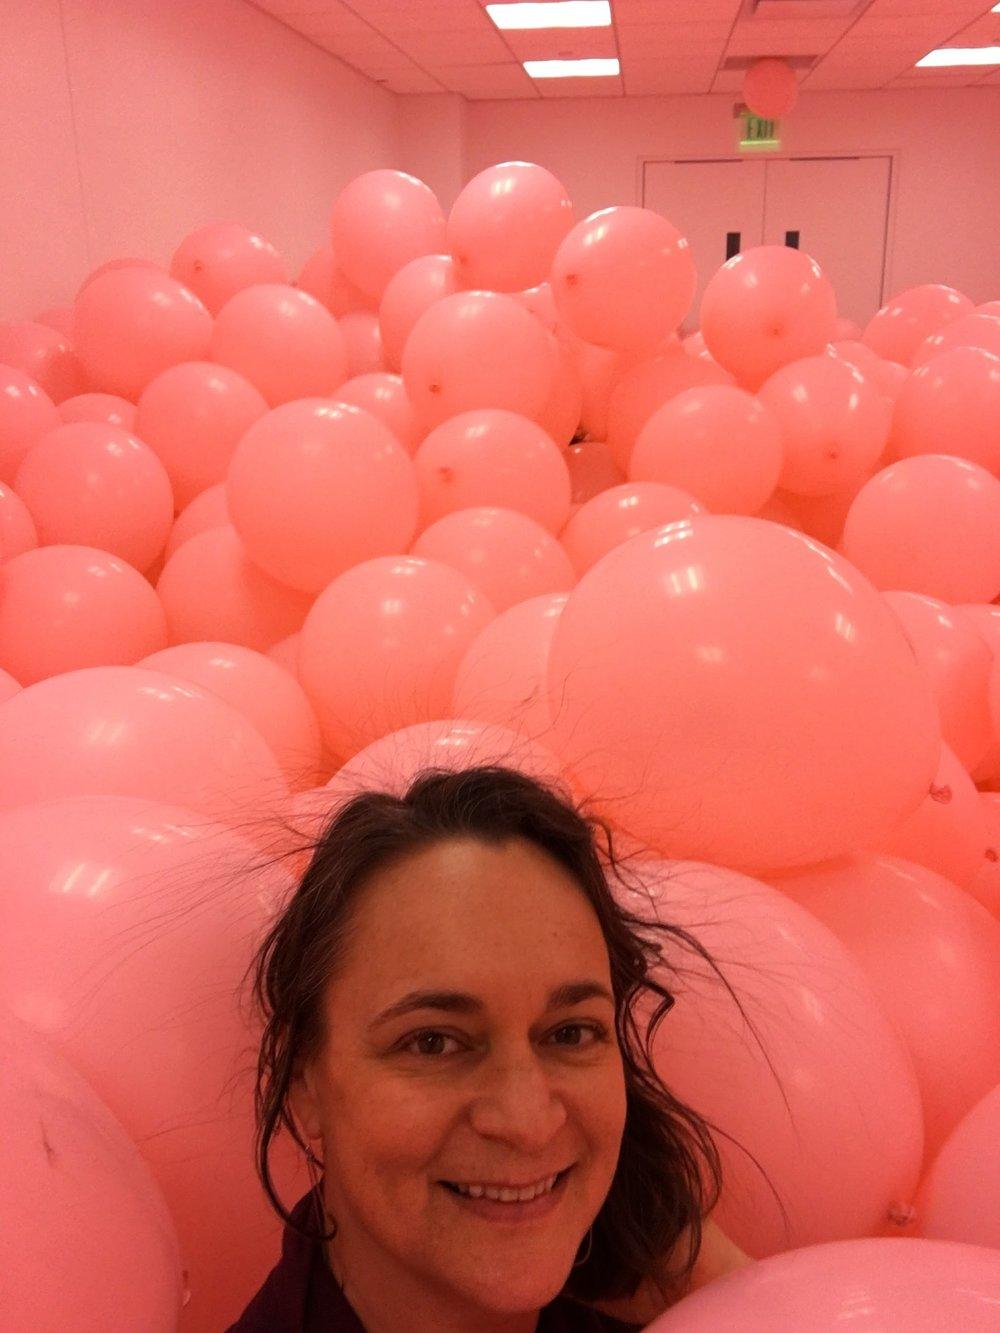 Selfie in the PlayTime exhibit